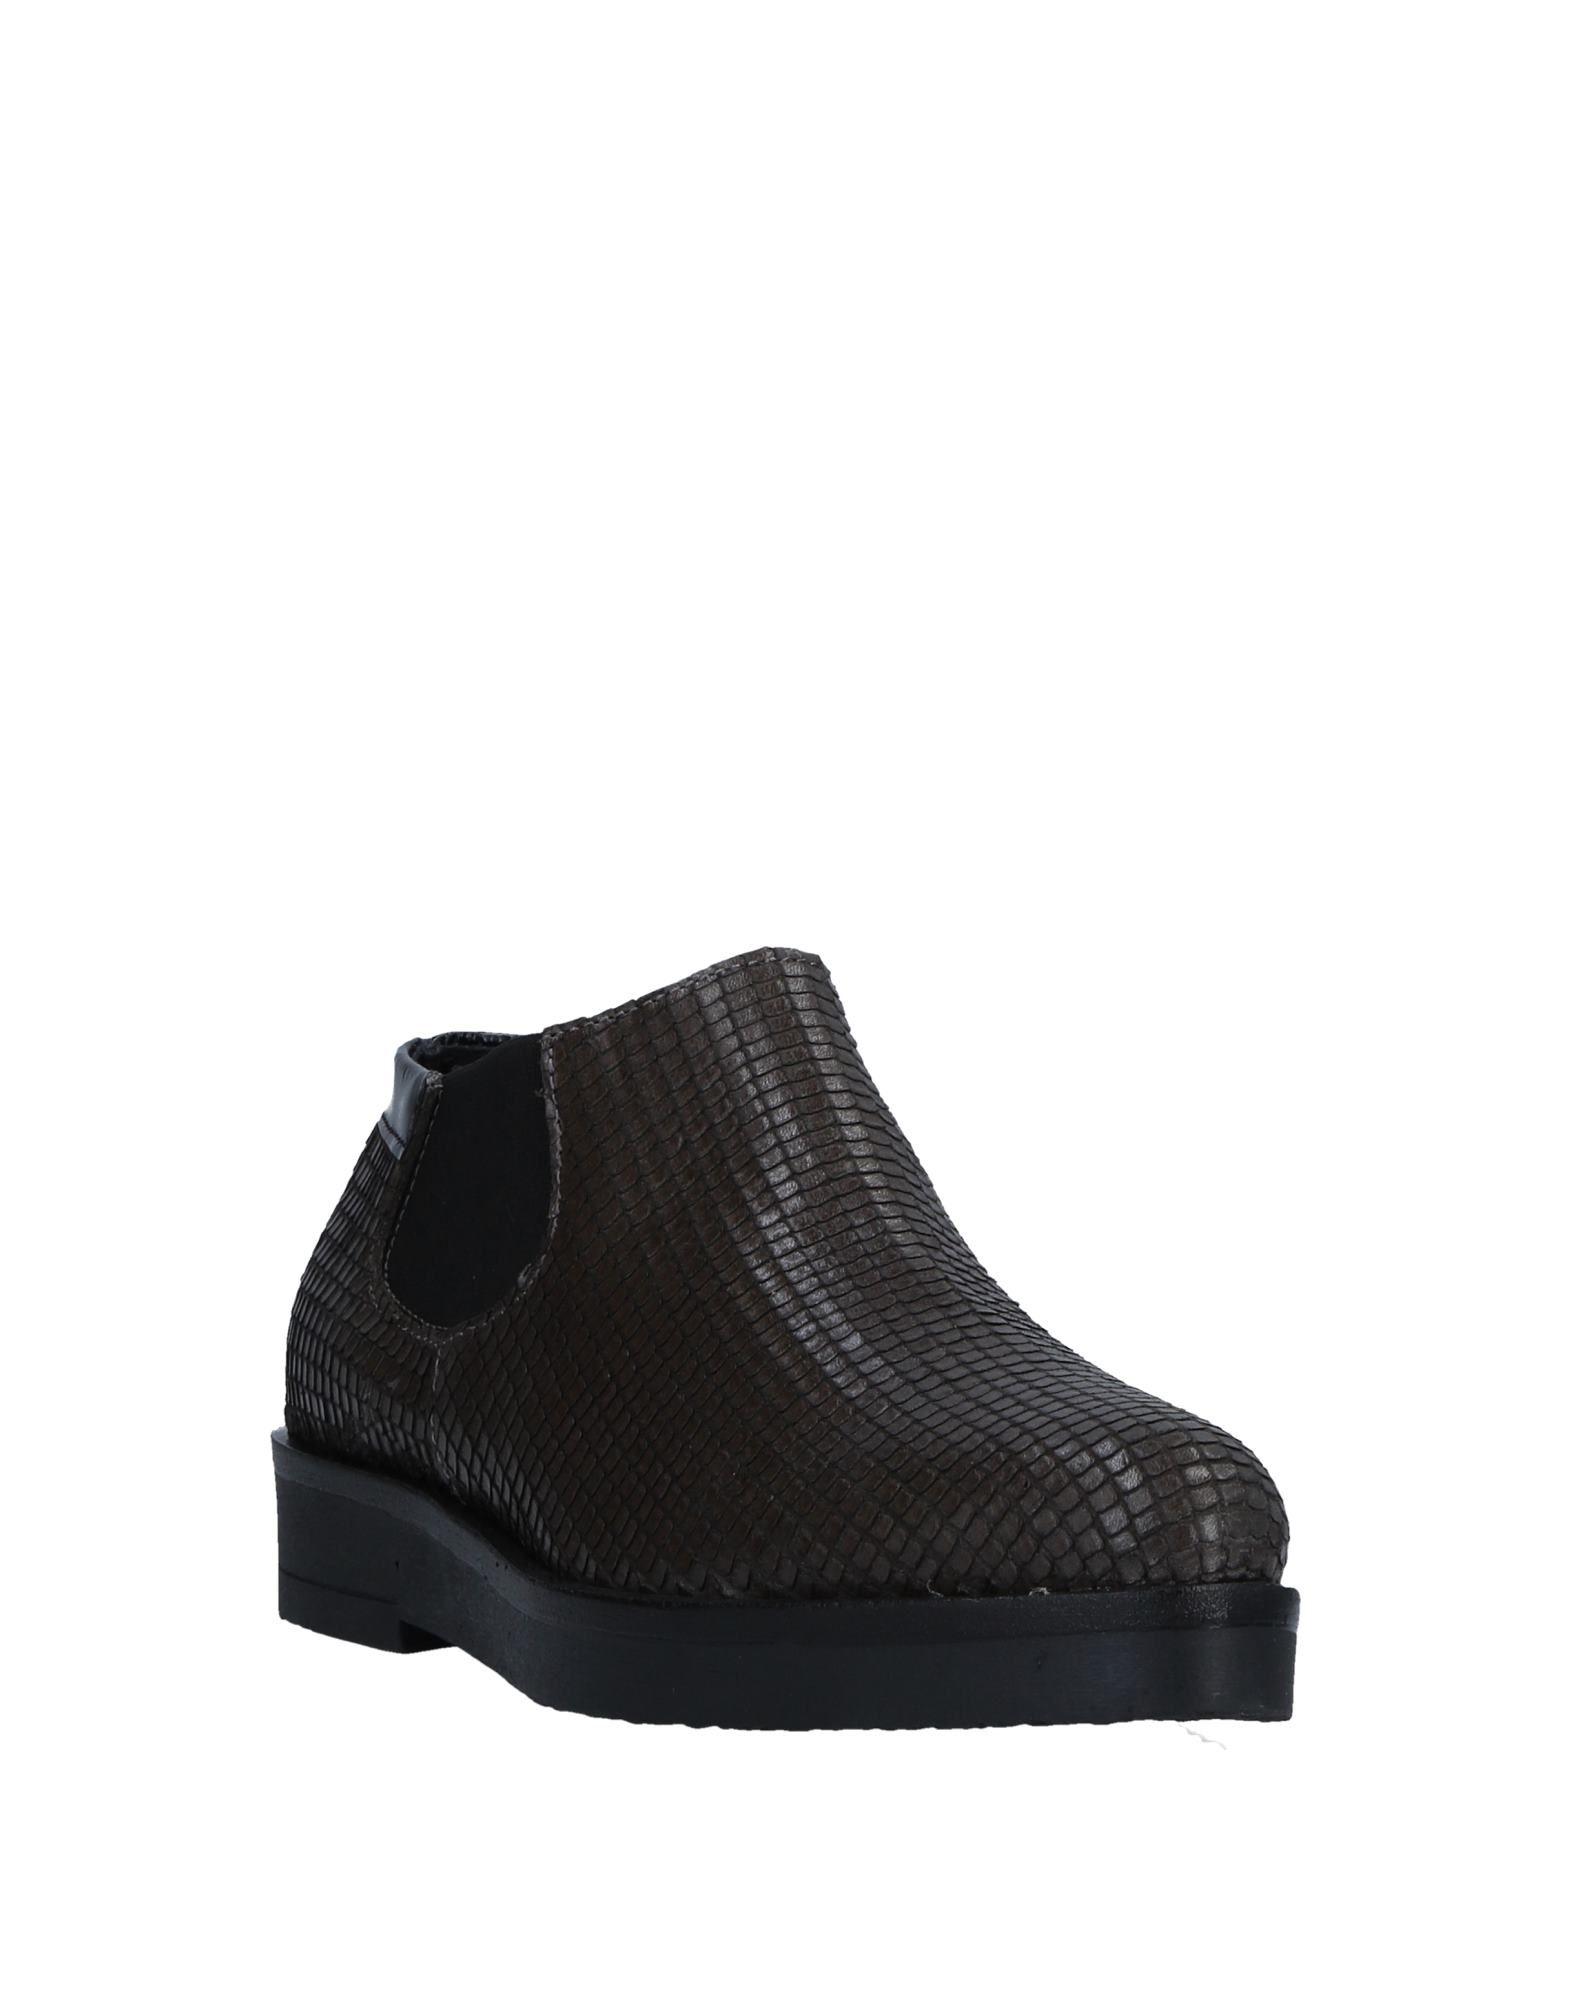 Lilimill Lilimill Lilimill Chelsea Boots Damen  11522407IK Gute Qualität beliebte Schuhe d8cd7c